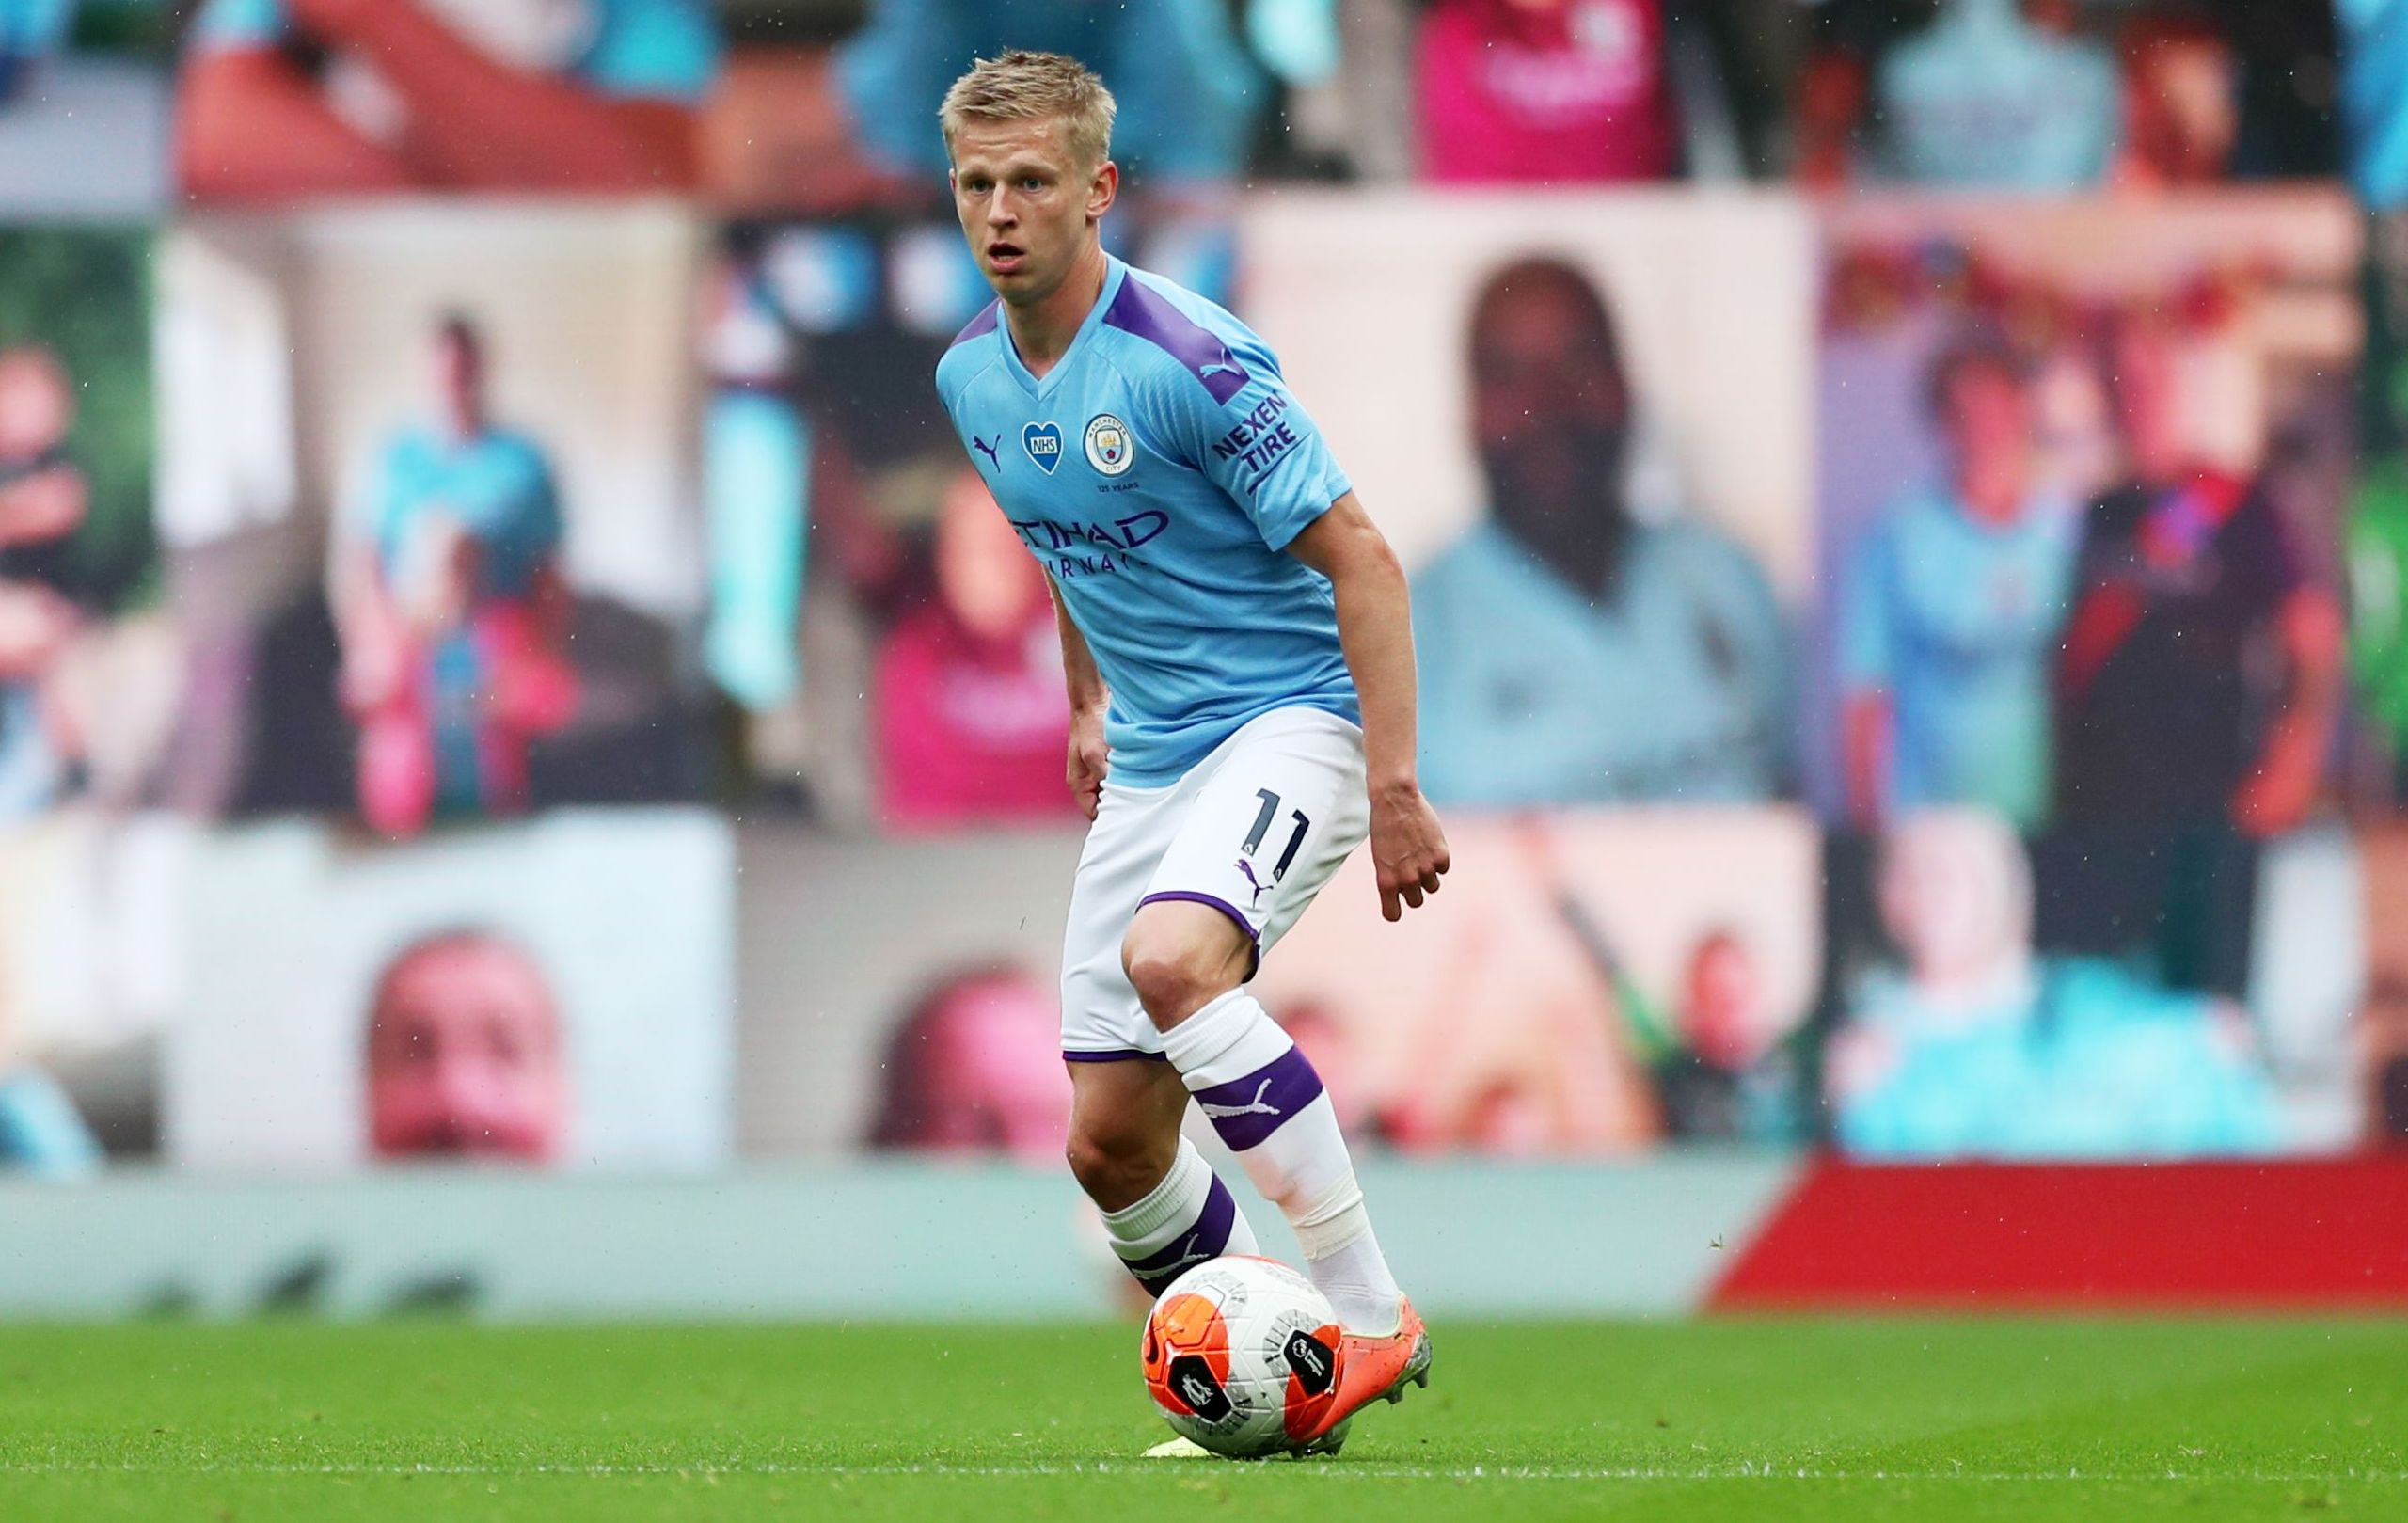 Football - Etranger - Premier League : Brighton-Manchester City en direct